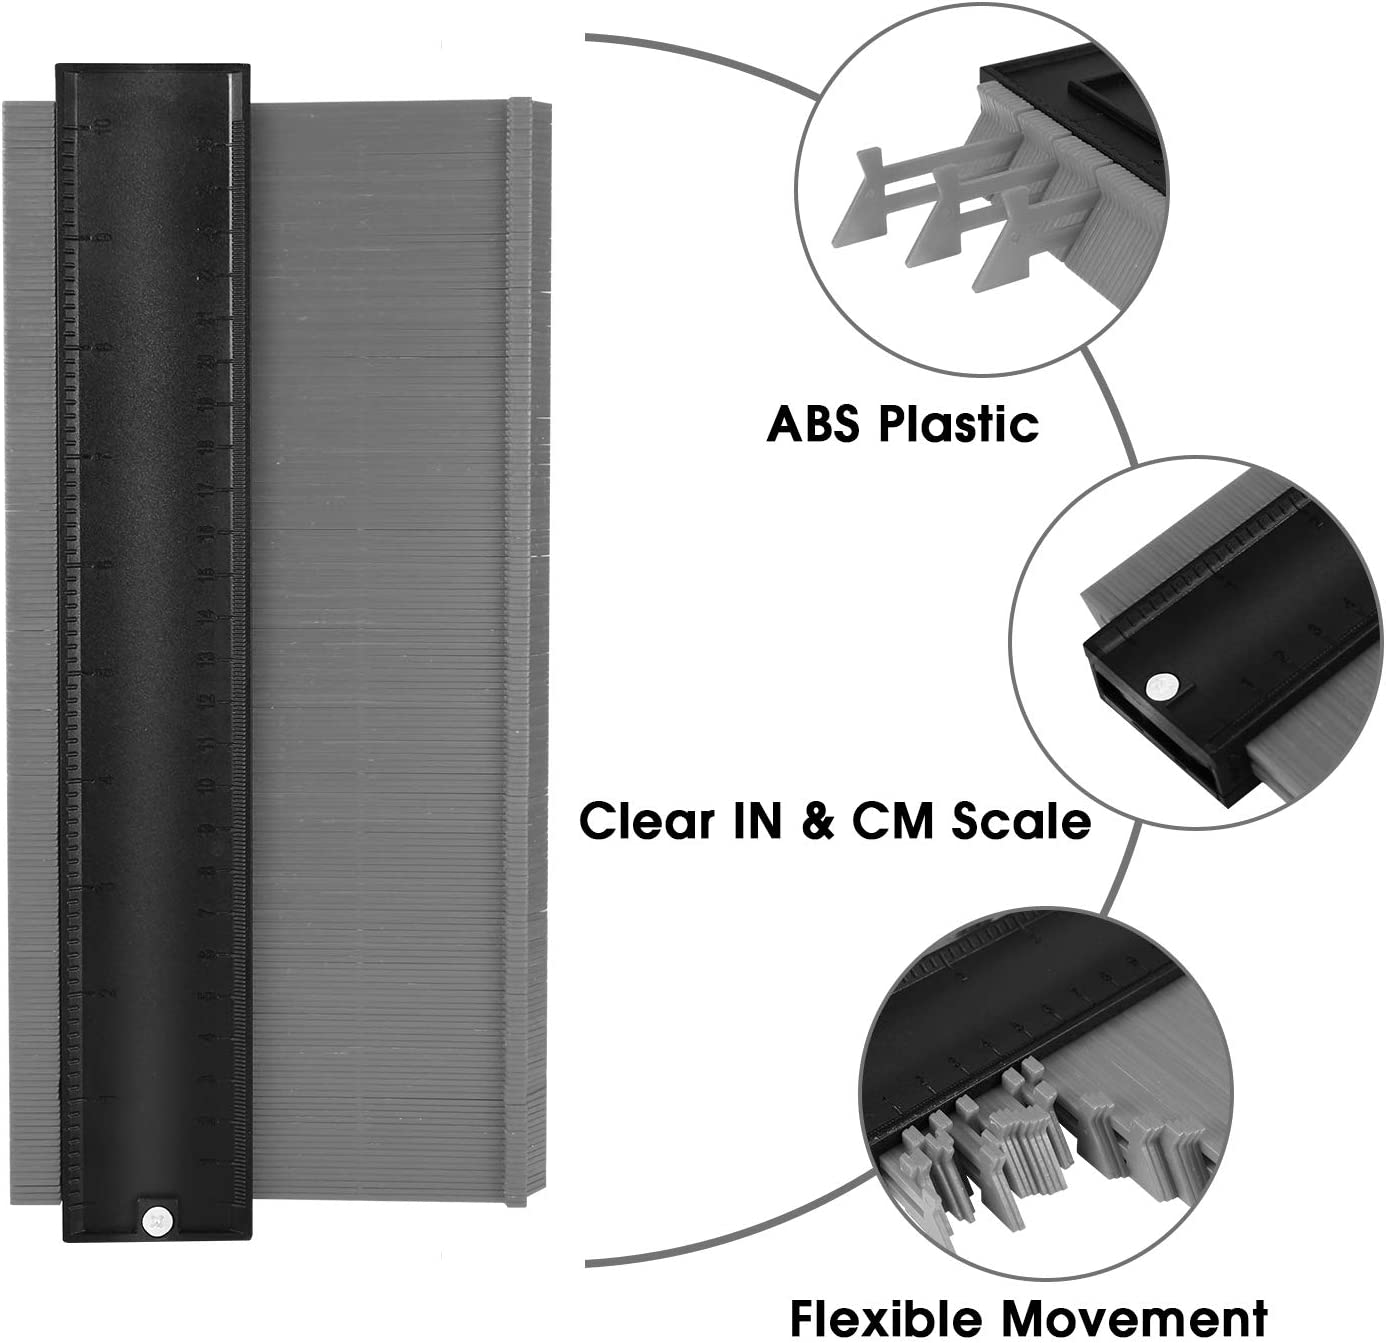 Master Outline Plastic Measuring Ruler Copy Irregular Shapes Tool for Corners Woodworking KEGOUU Contour Gauge Duplicator with Lock 10inch 5inch Contour Profile Gauge Tool with Lock